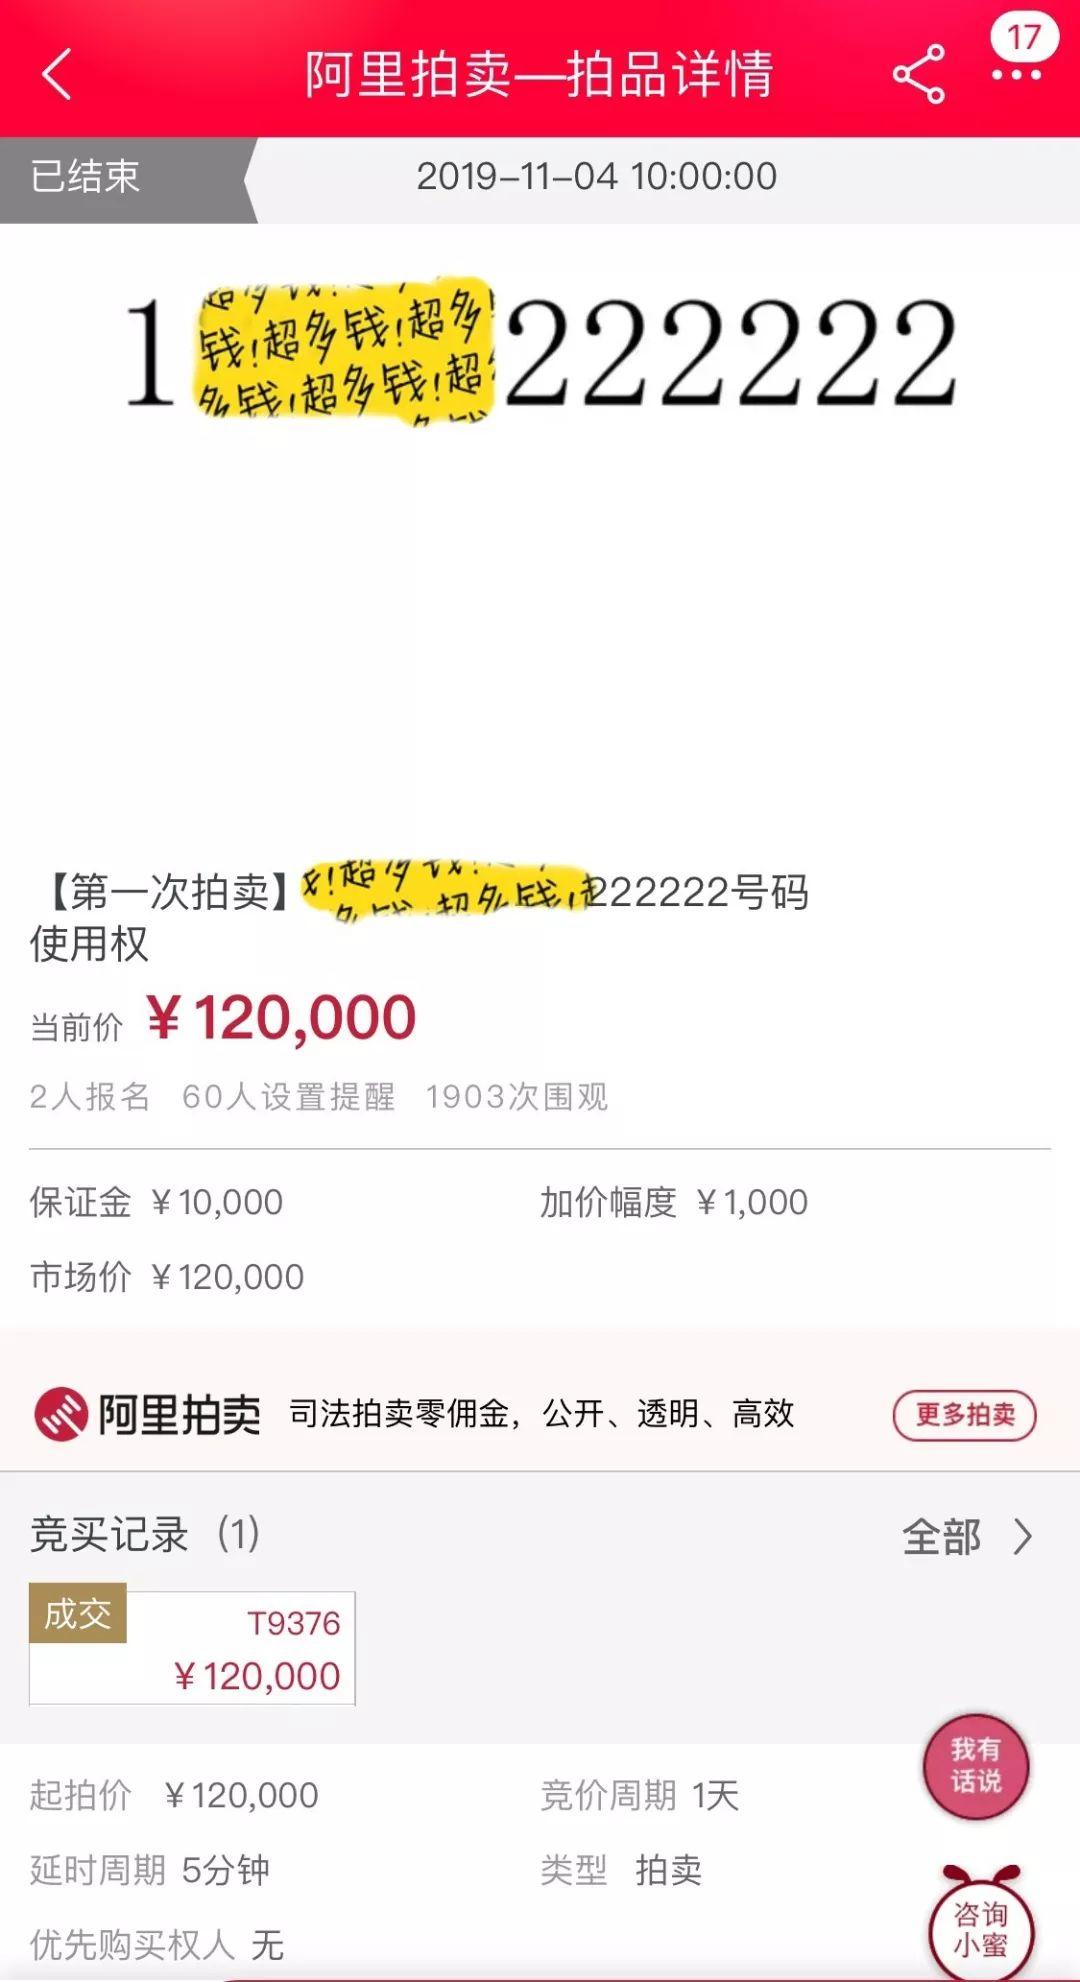 http://www.axxxc.com/kejishuma/1059325.html